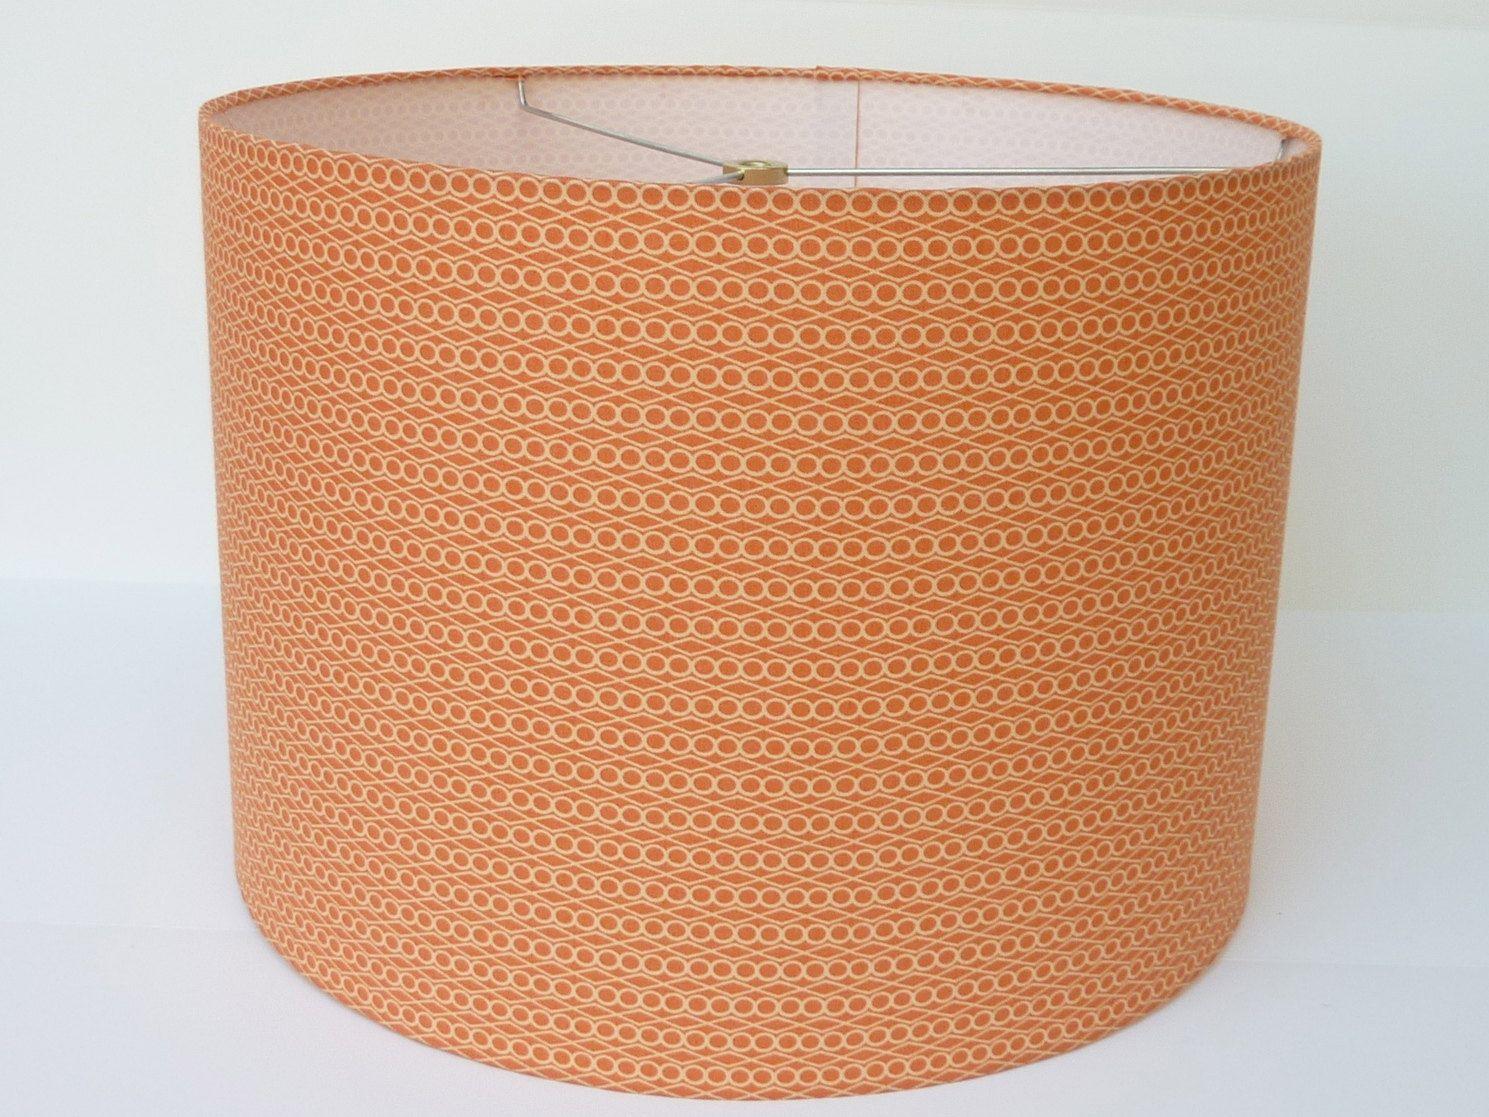 Drum lamp shade in soft orange geometric fabric 6500 via etsy drum lamp shade in soft orange geometric fabric 6500 via etsy aloadofball Gallery